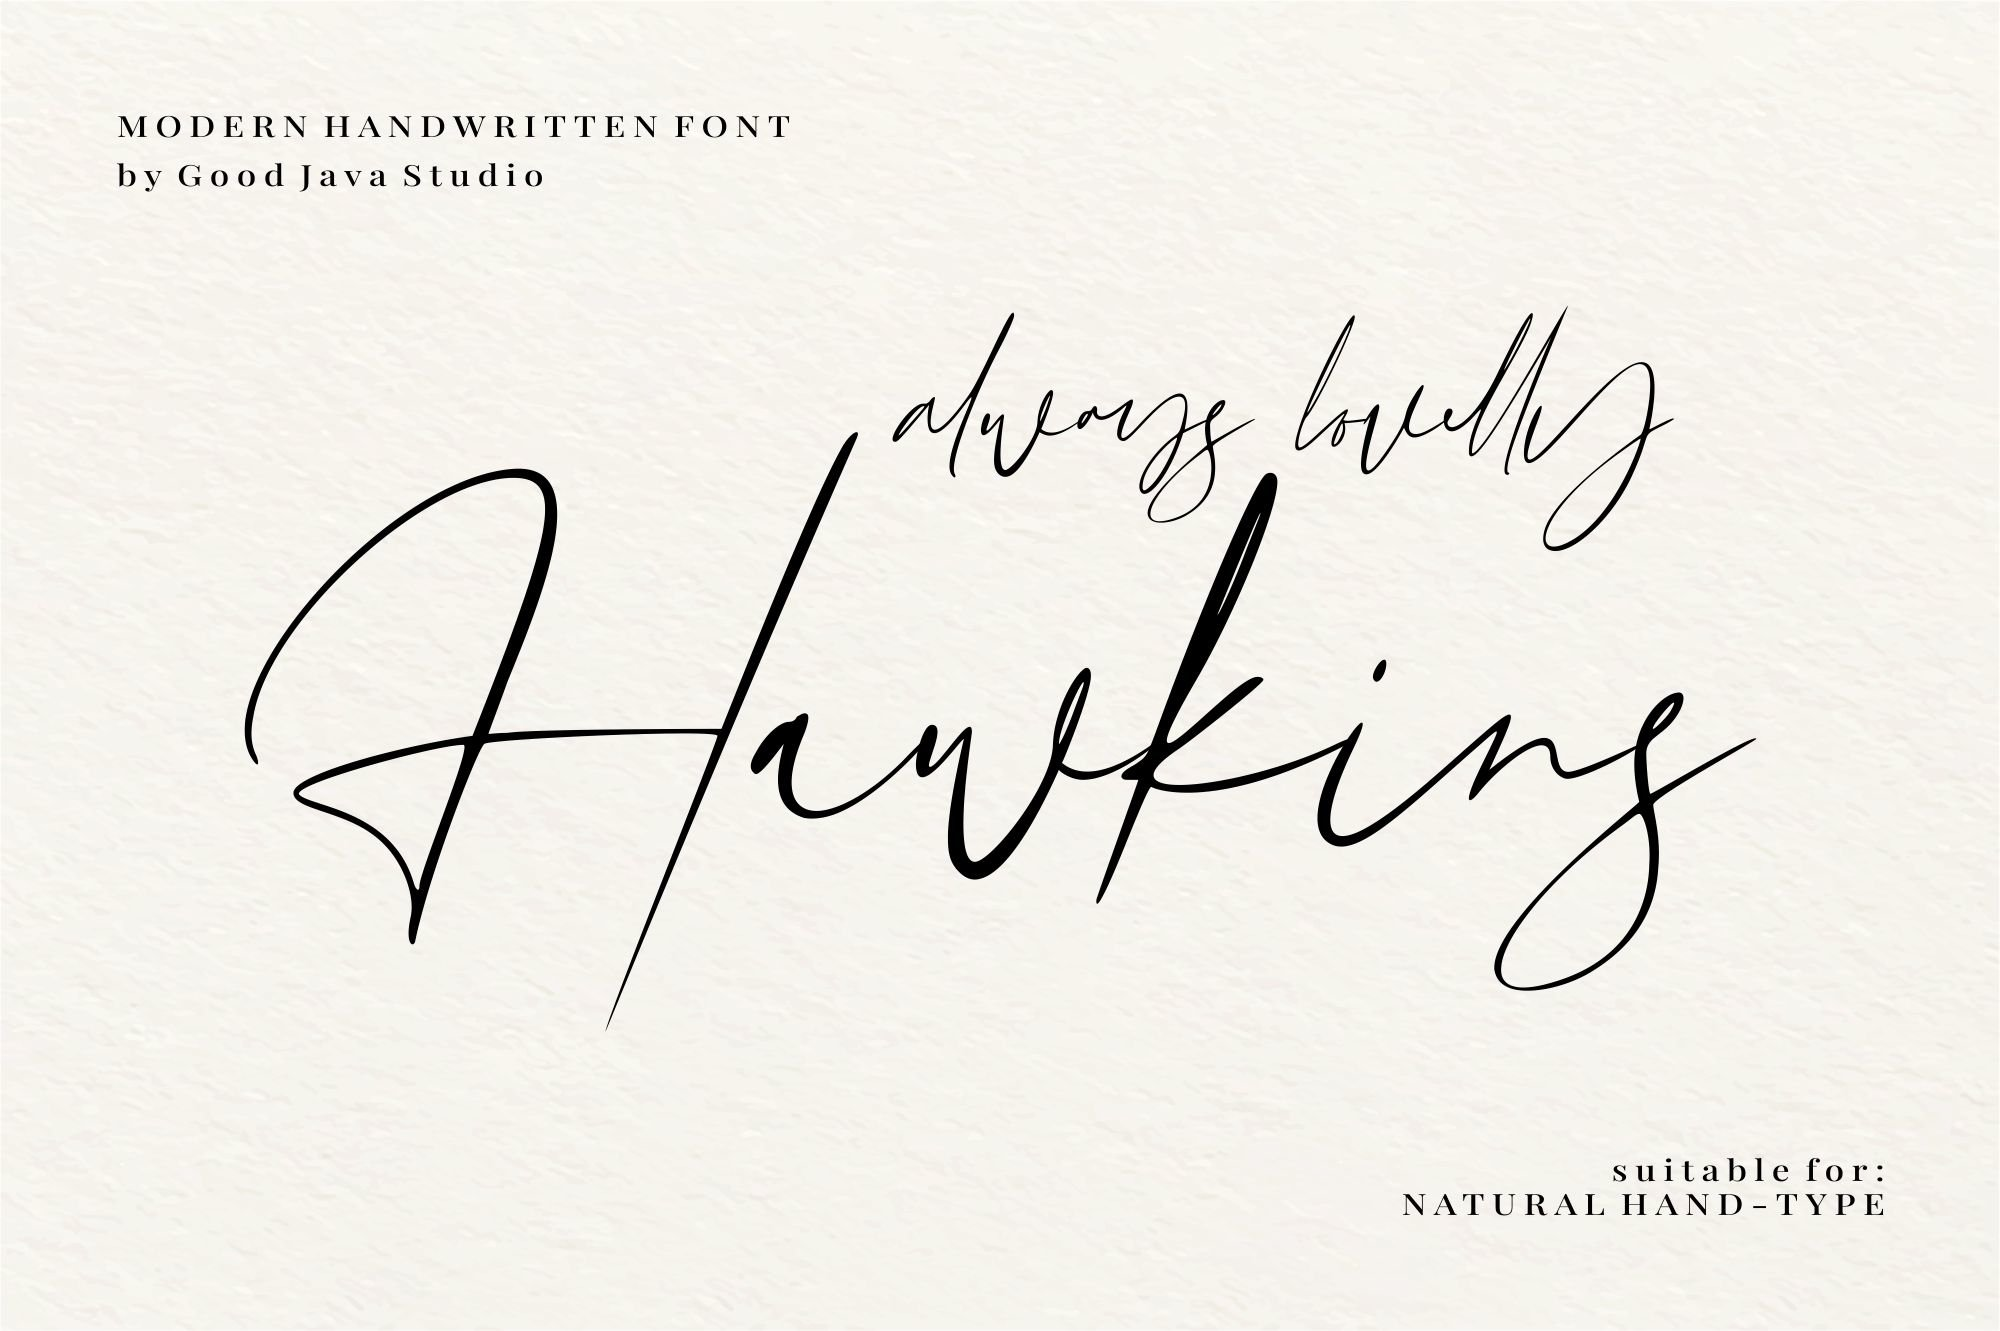 Dutchly - Modern Handwritten example image 4